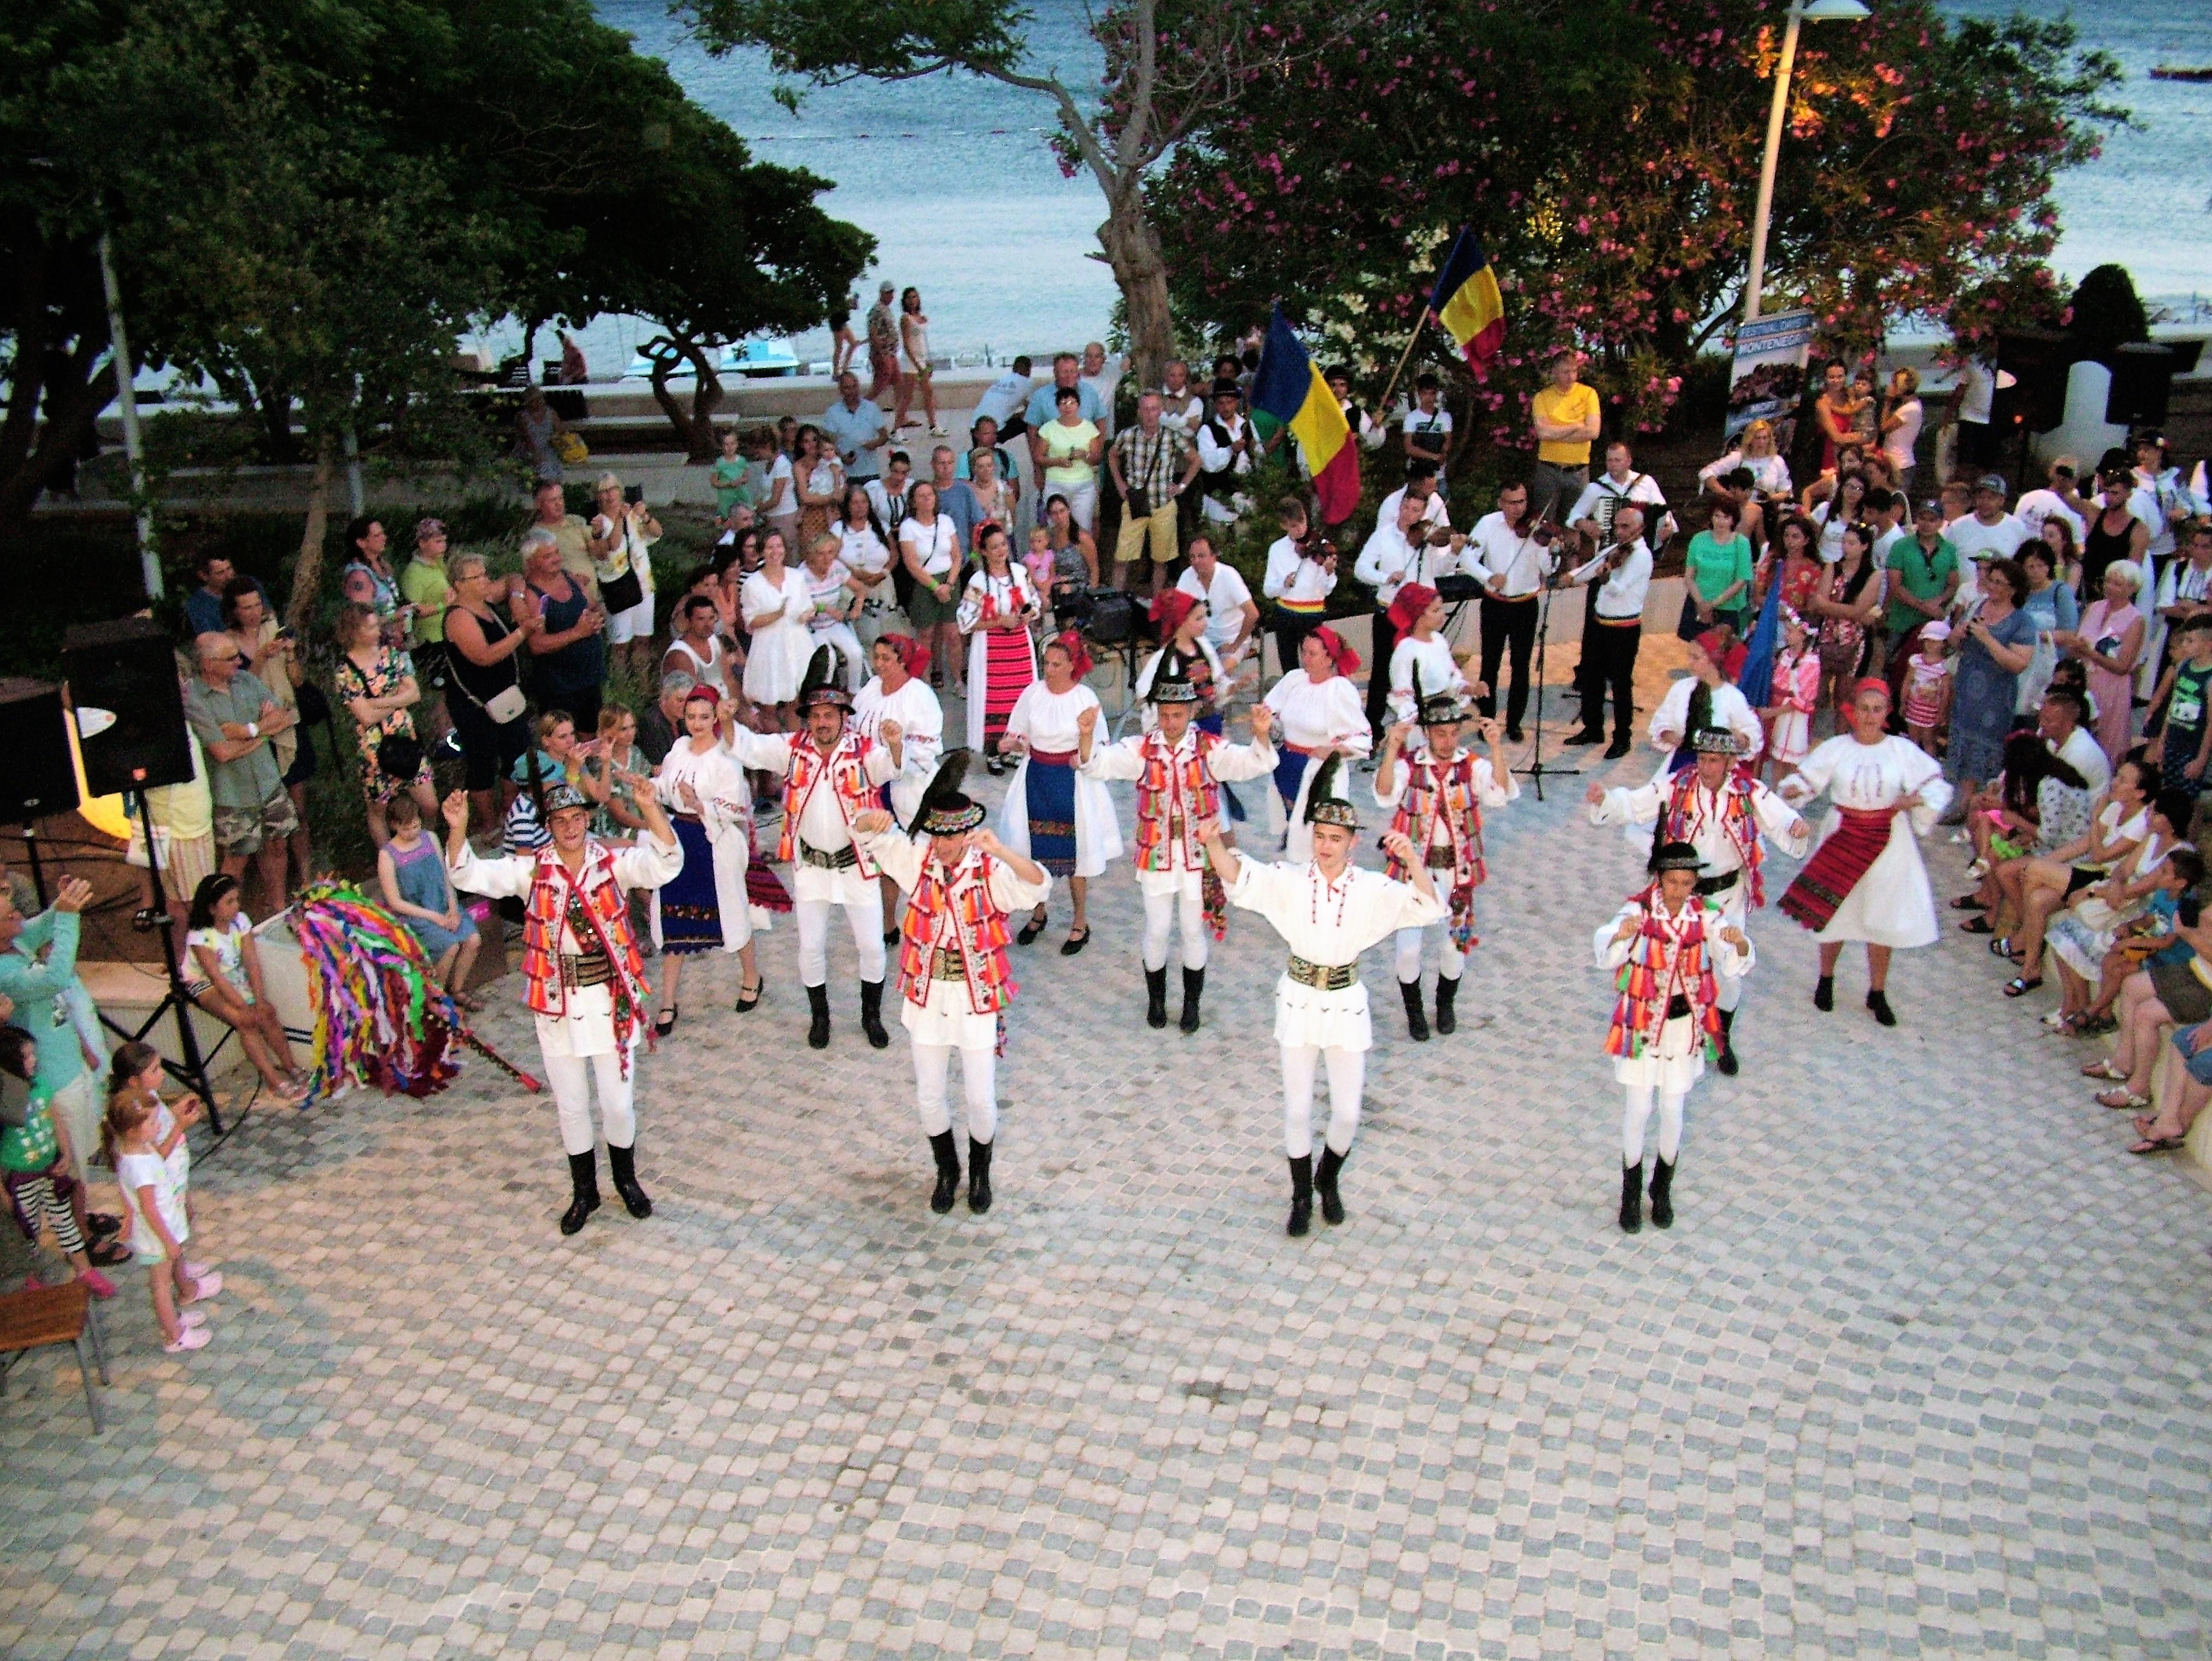 medjunarodni folklorni festival 2019 petrovac 2